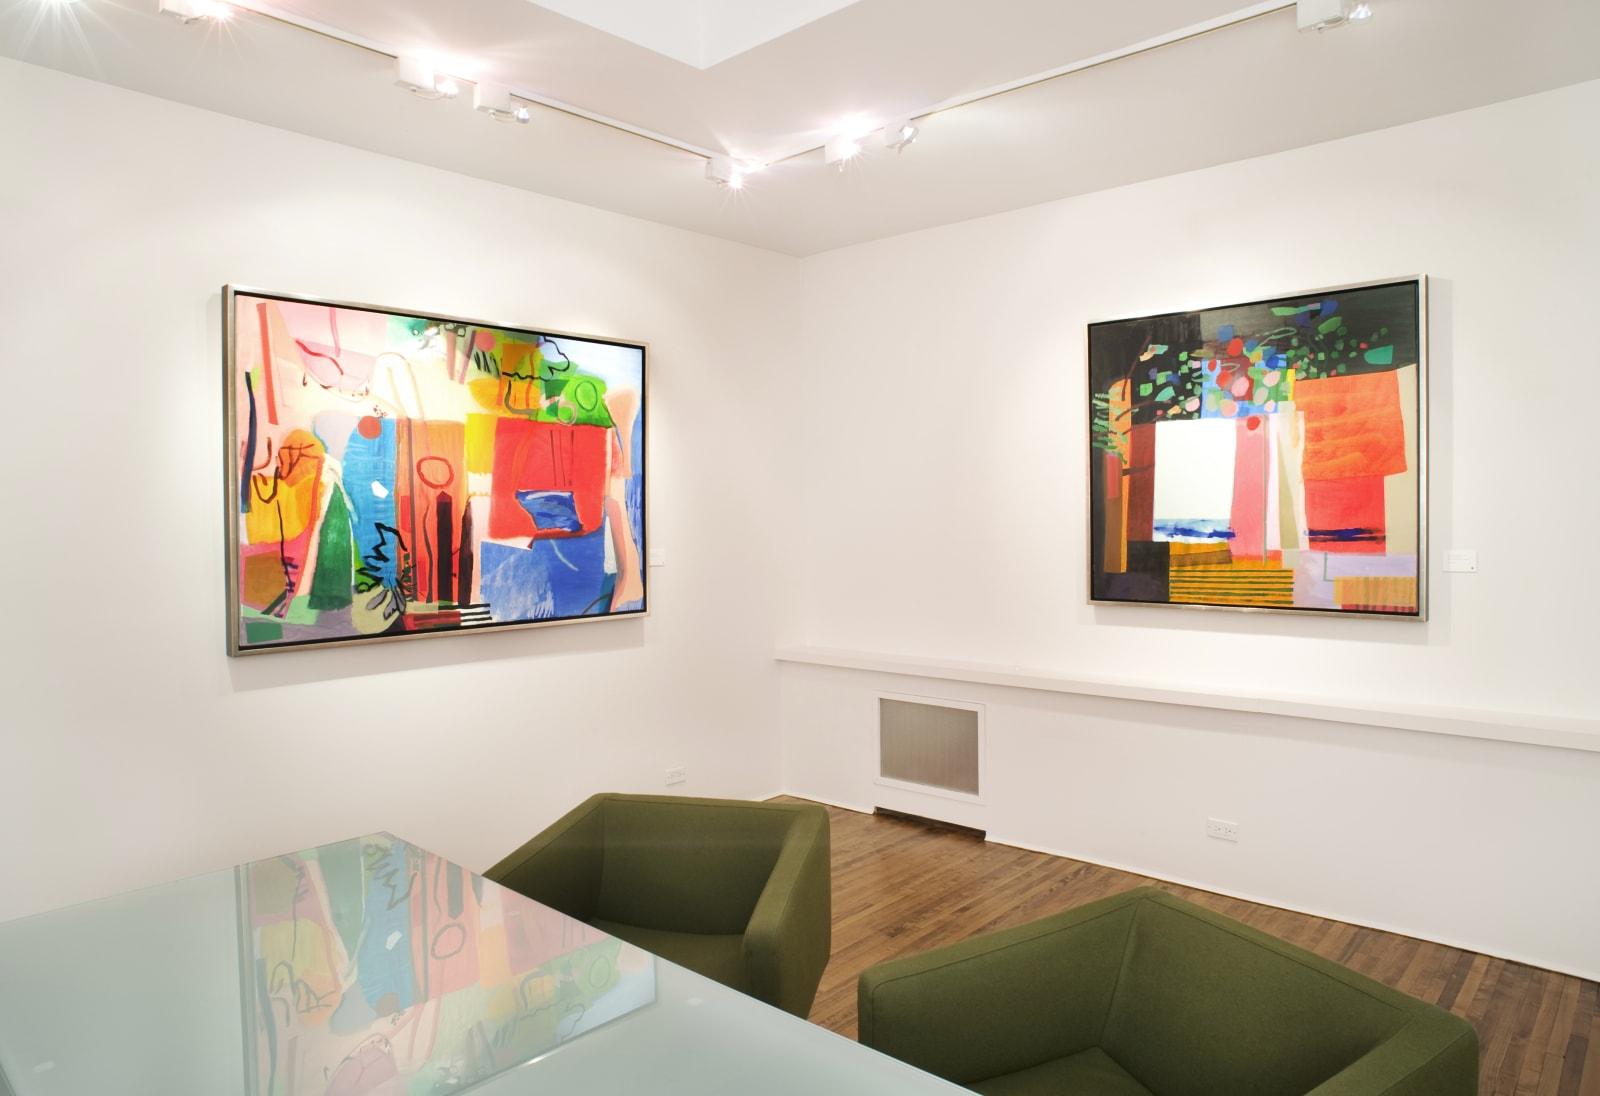 Installation view: Bill Scott